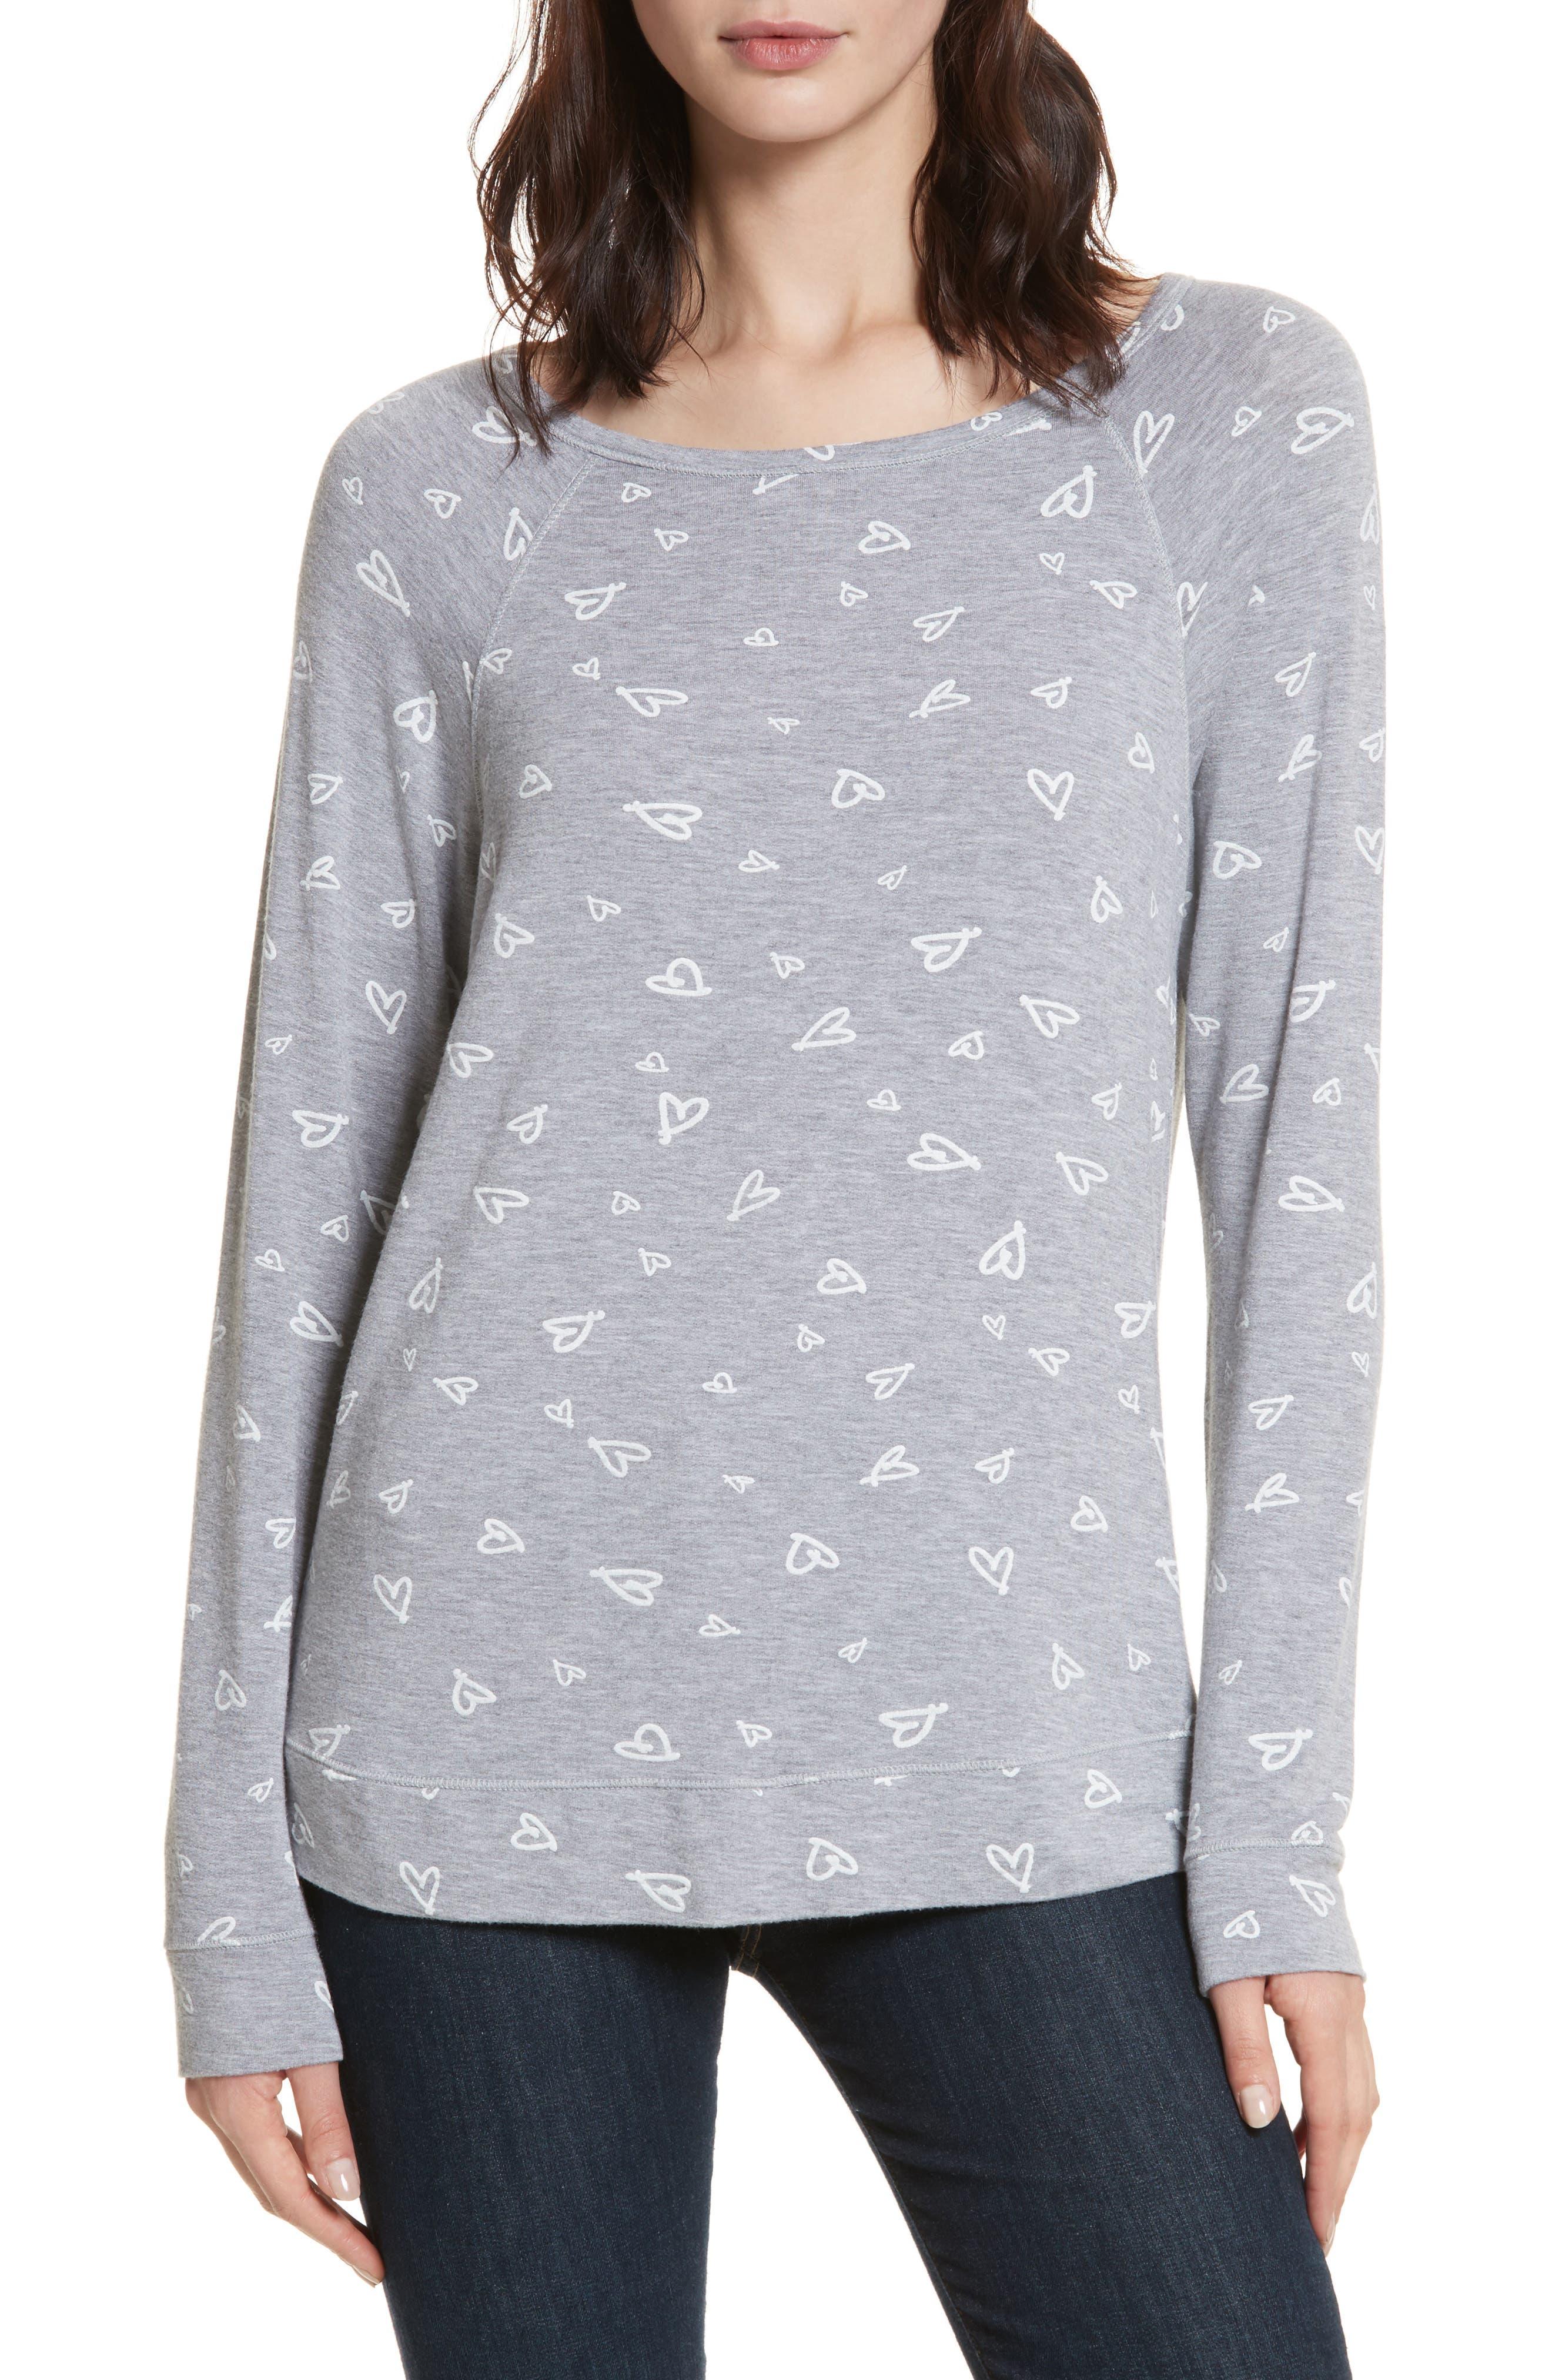 Main Image - Joie Annora B Print Cotton & Modal Blend Sweatshirt